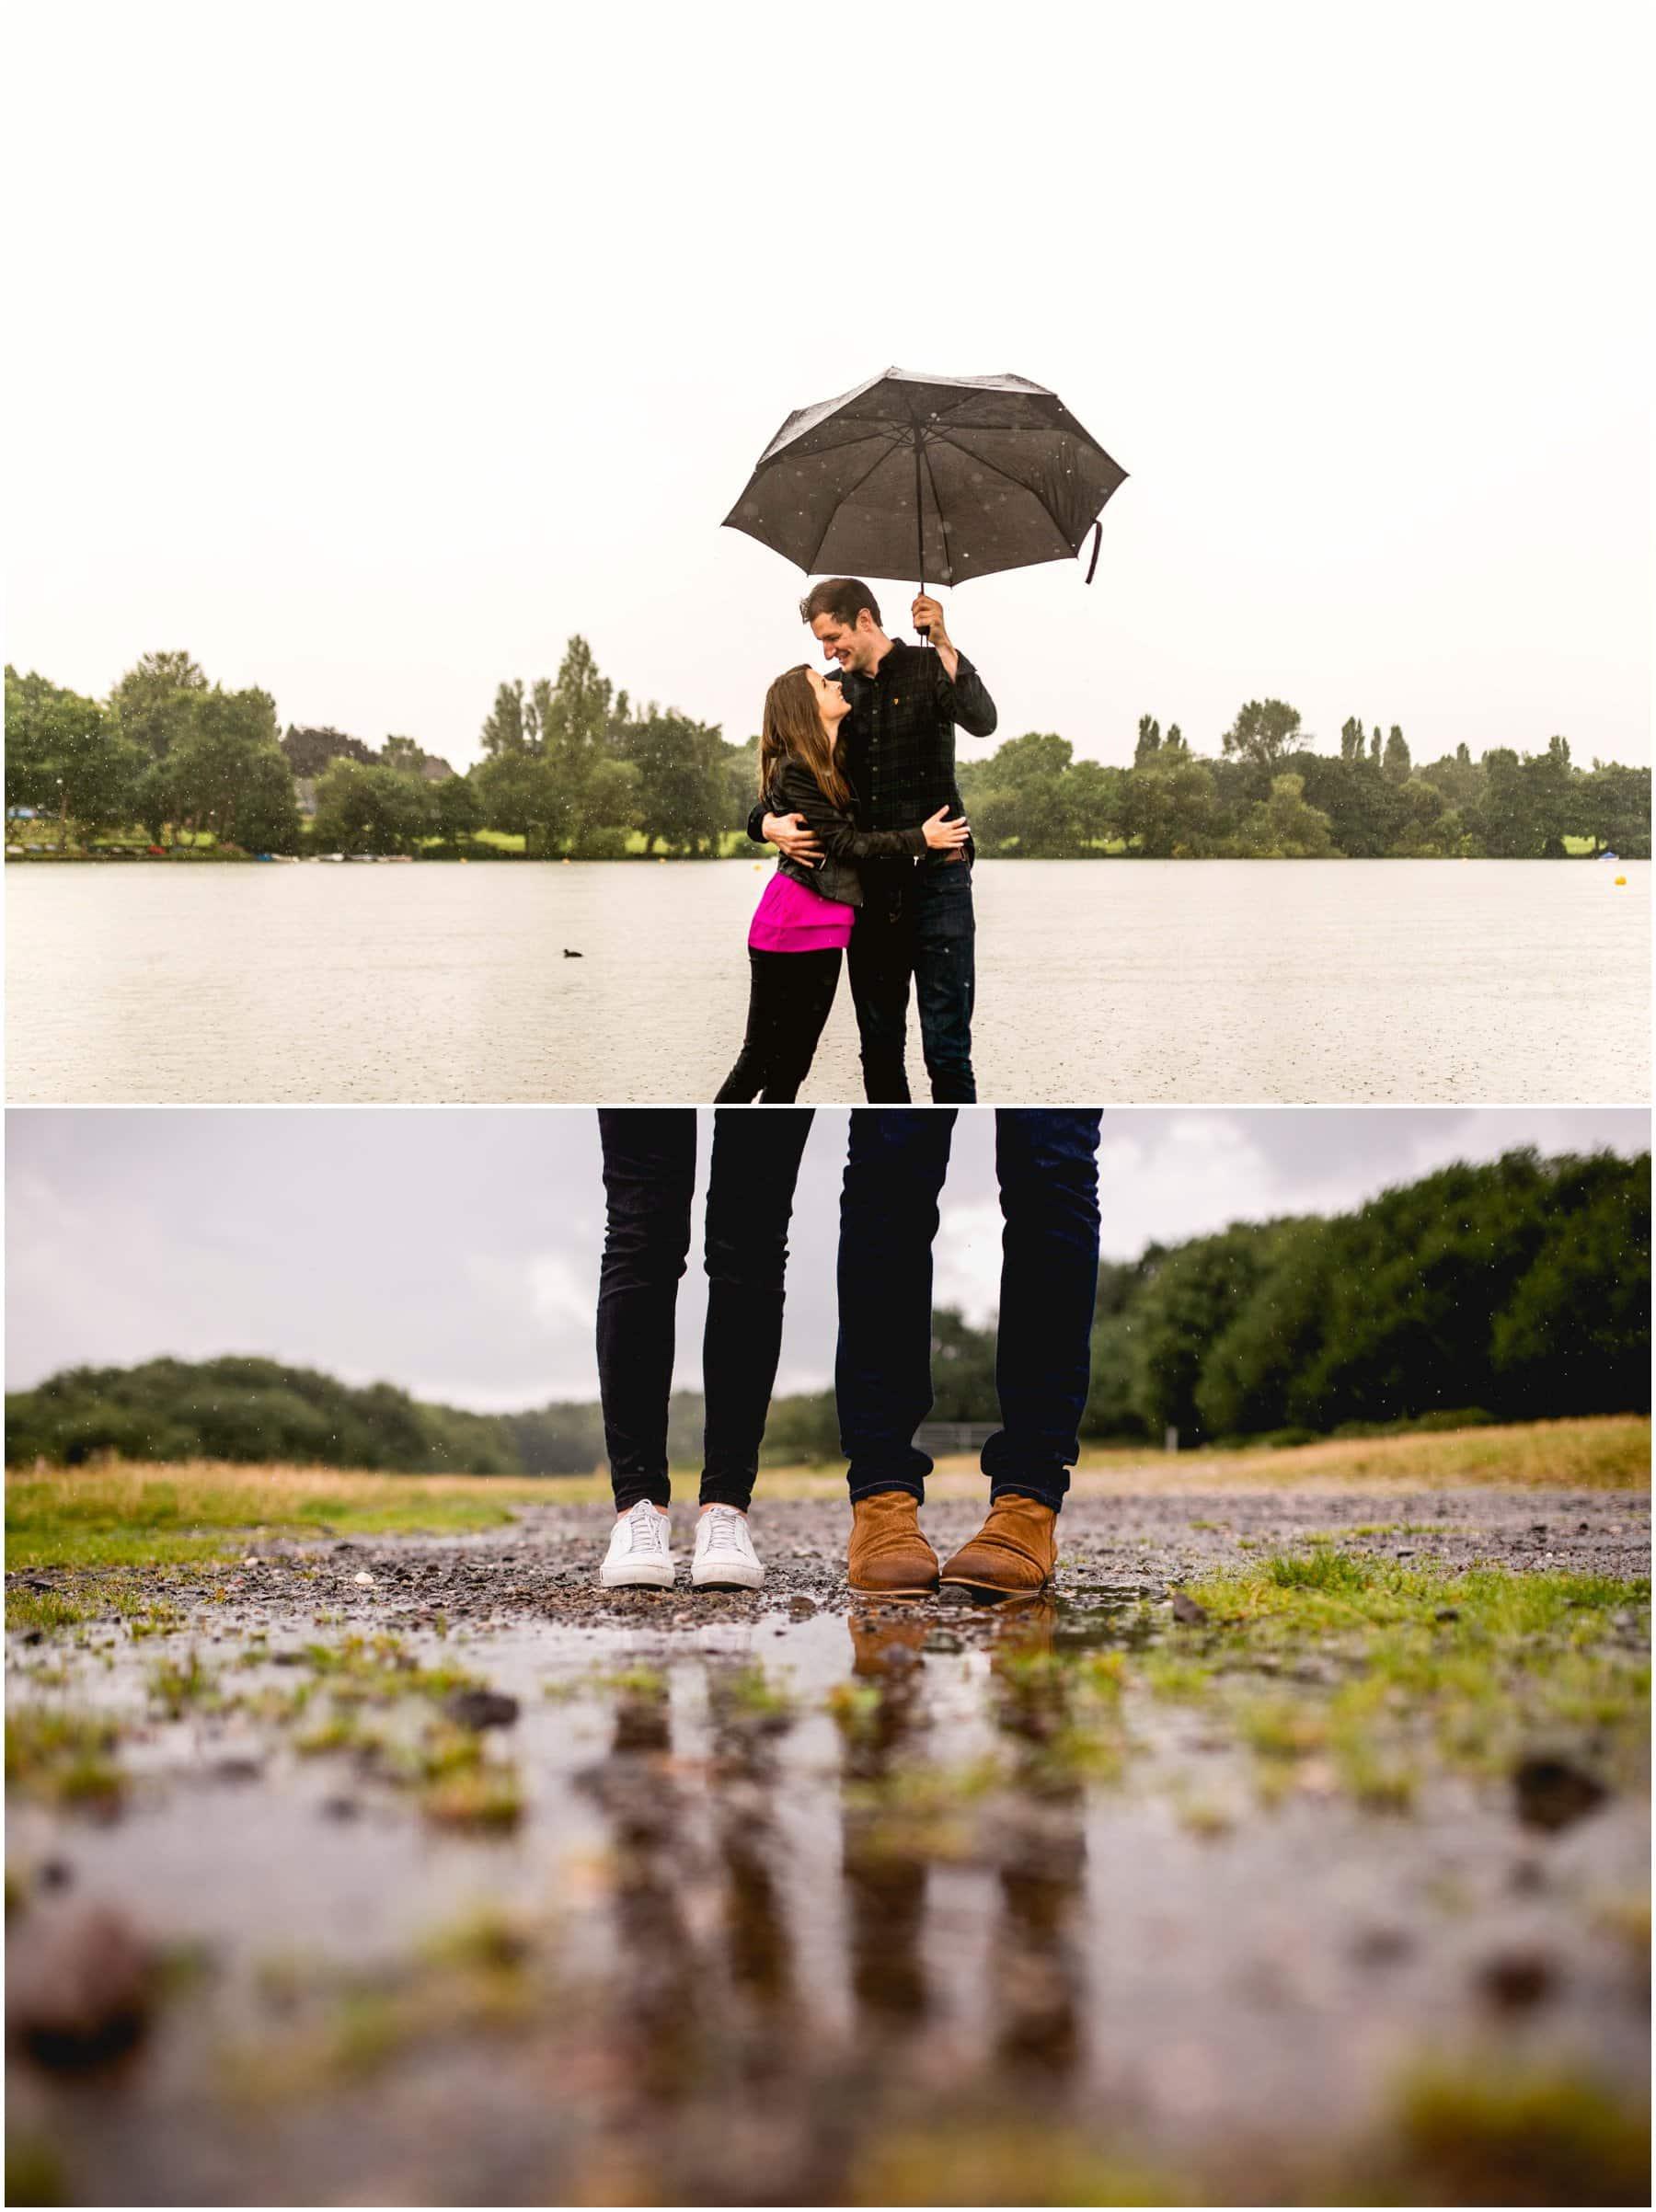 Fiona and Matt Pre Wedding Engagement Shoot in Sutton Park, Sutton Coldfield by West Midlands Wedding Photographer, Lisa Carpenter Photography